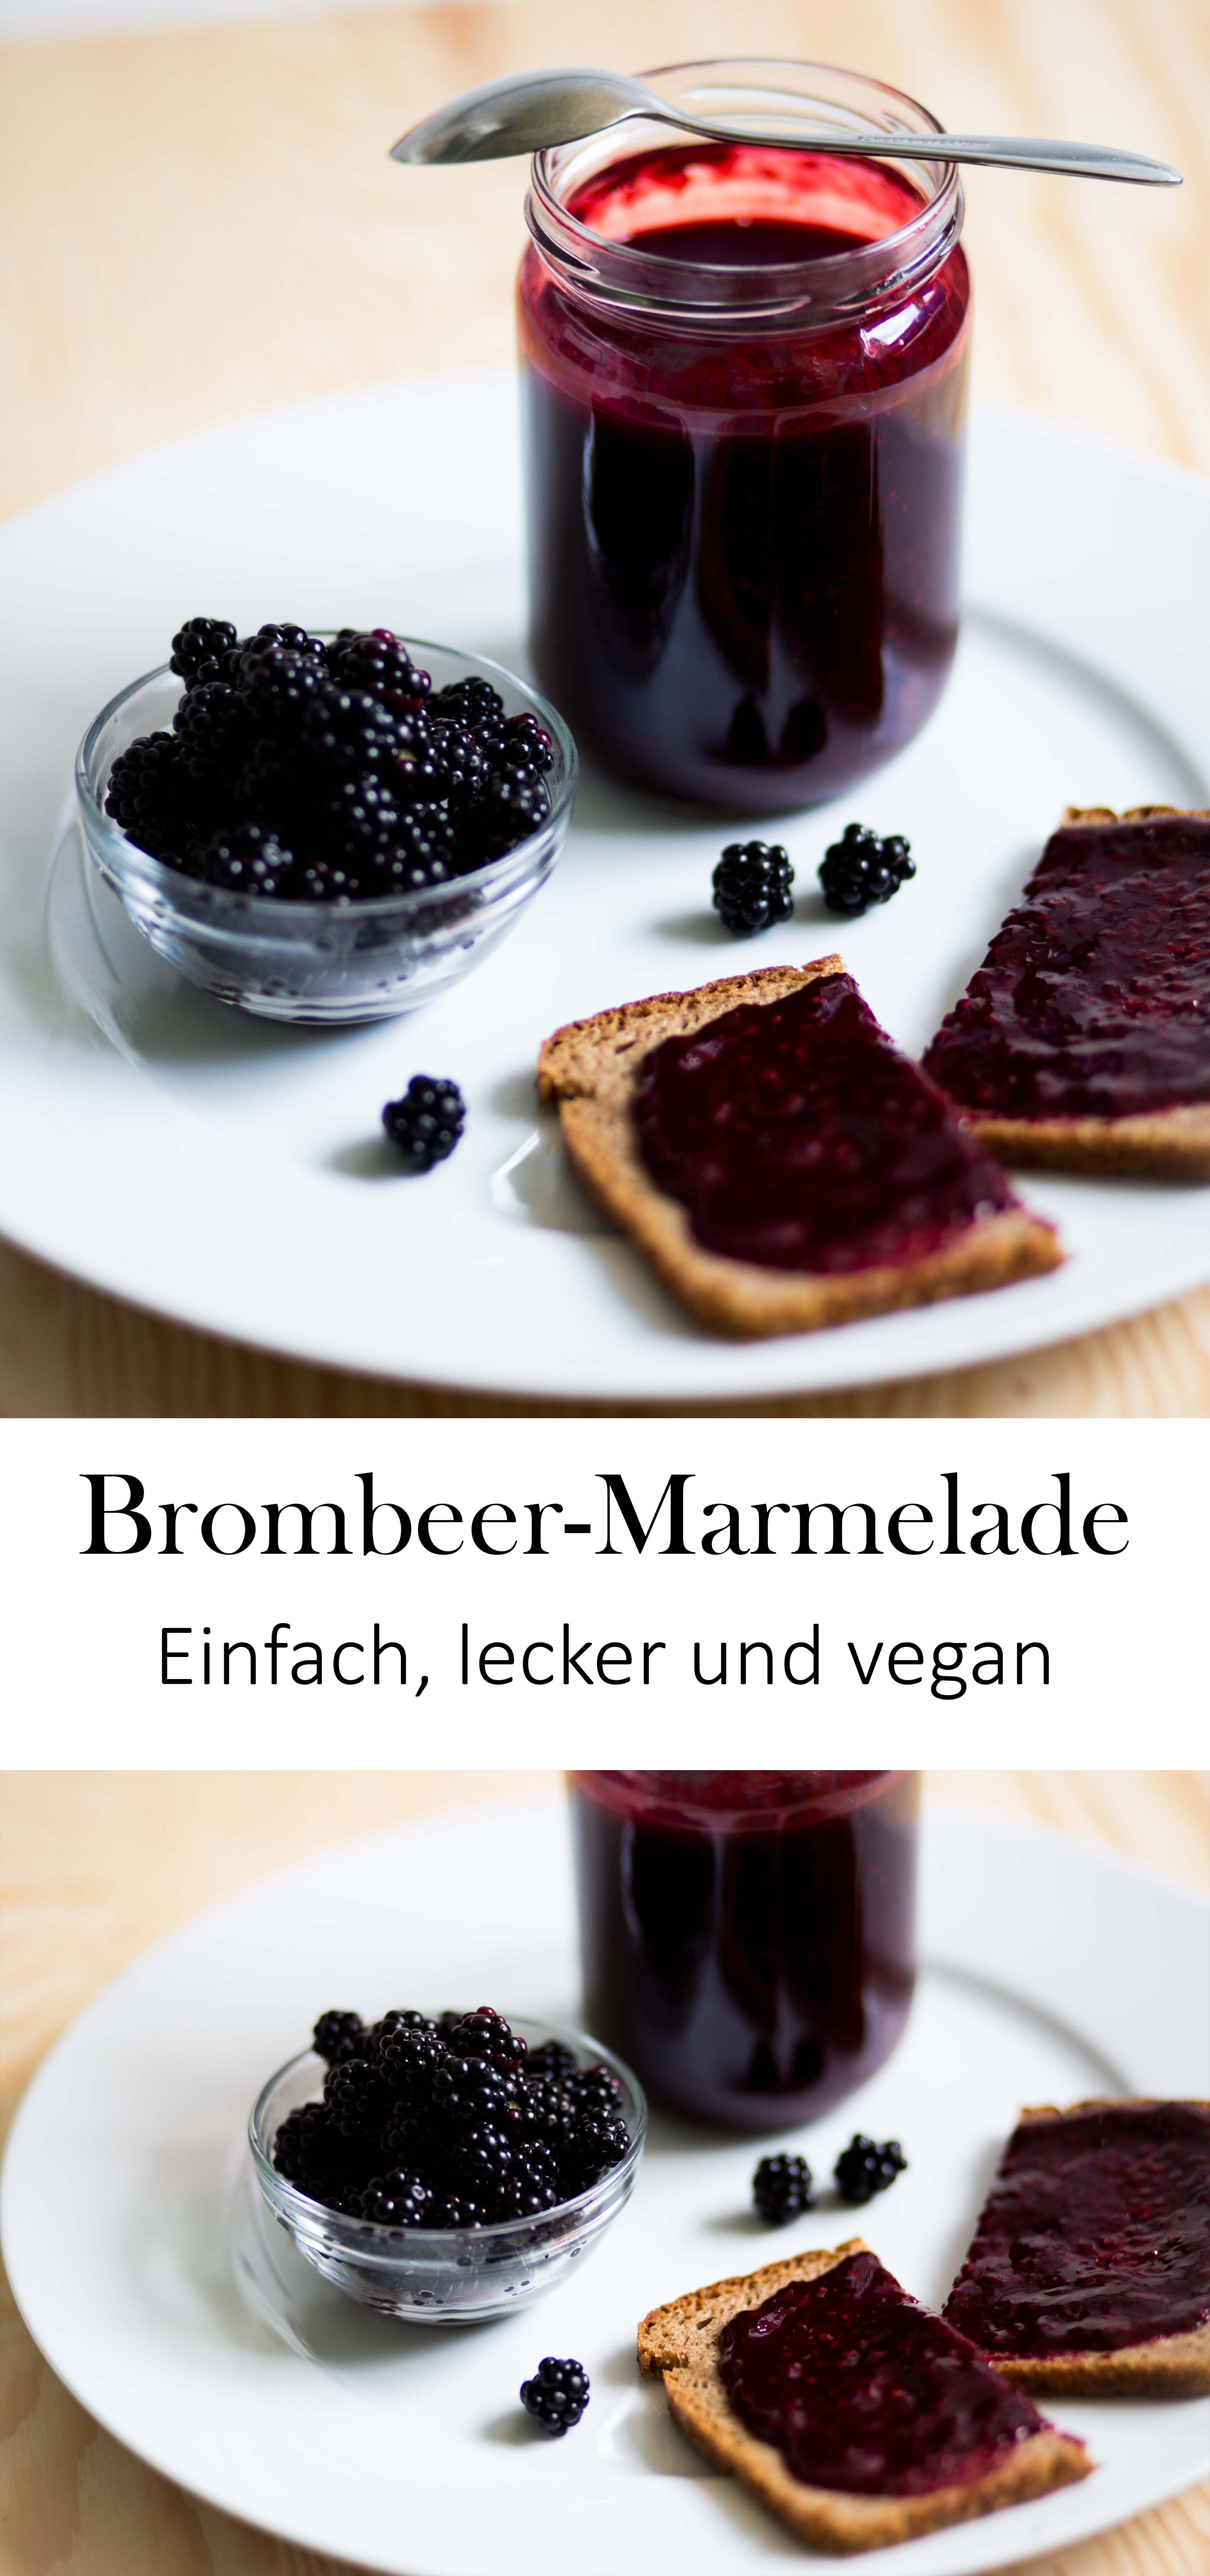 brombeer marmelade lecker einfach und vegan the ognc. Black Bedroom Furniture Sets. Home Design Ideas